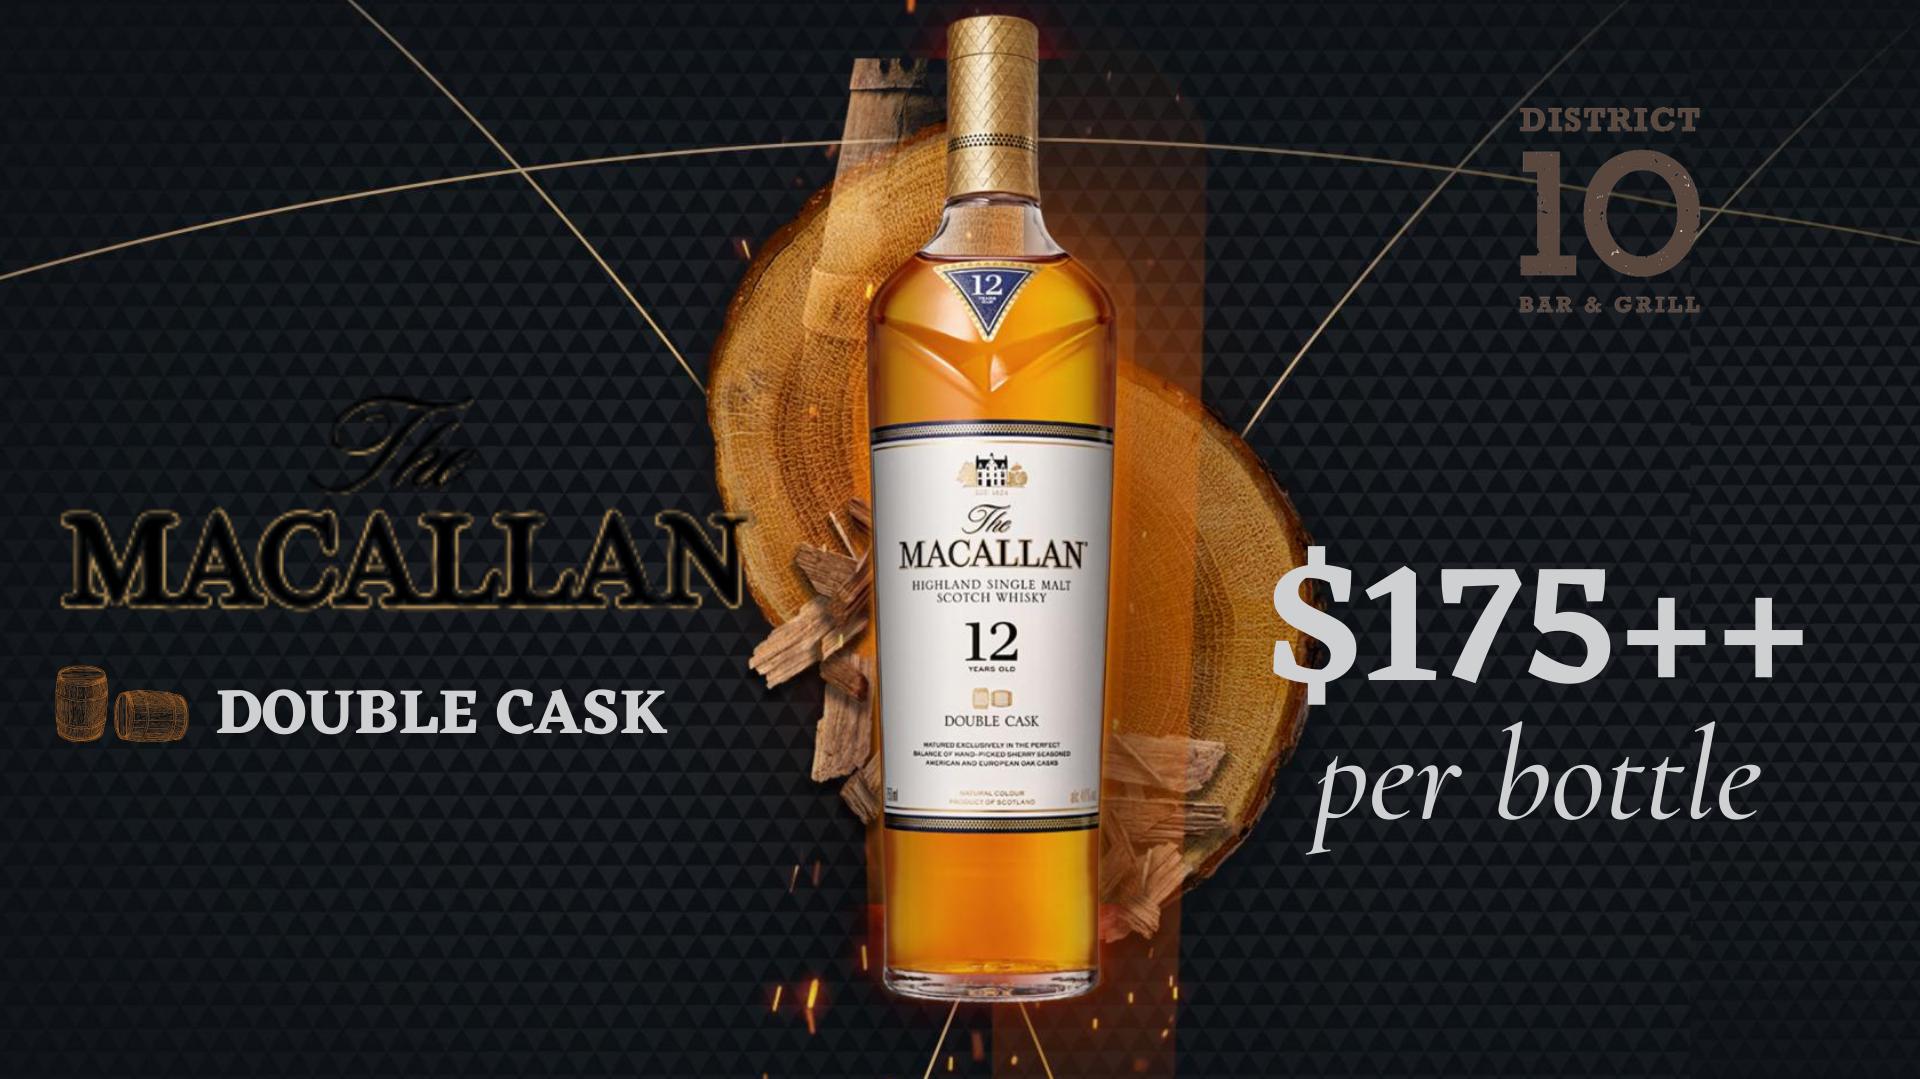 Maccallan TV Slide